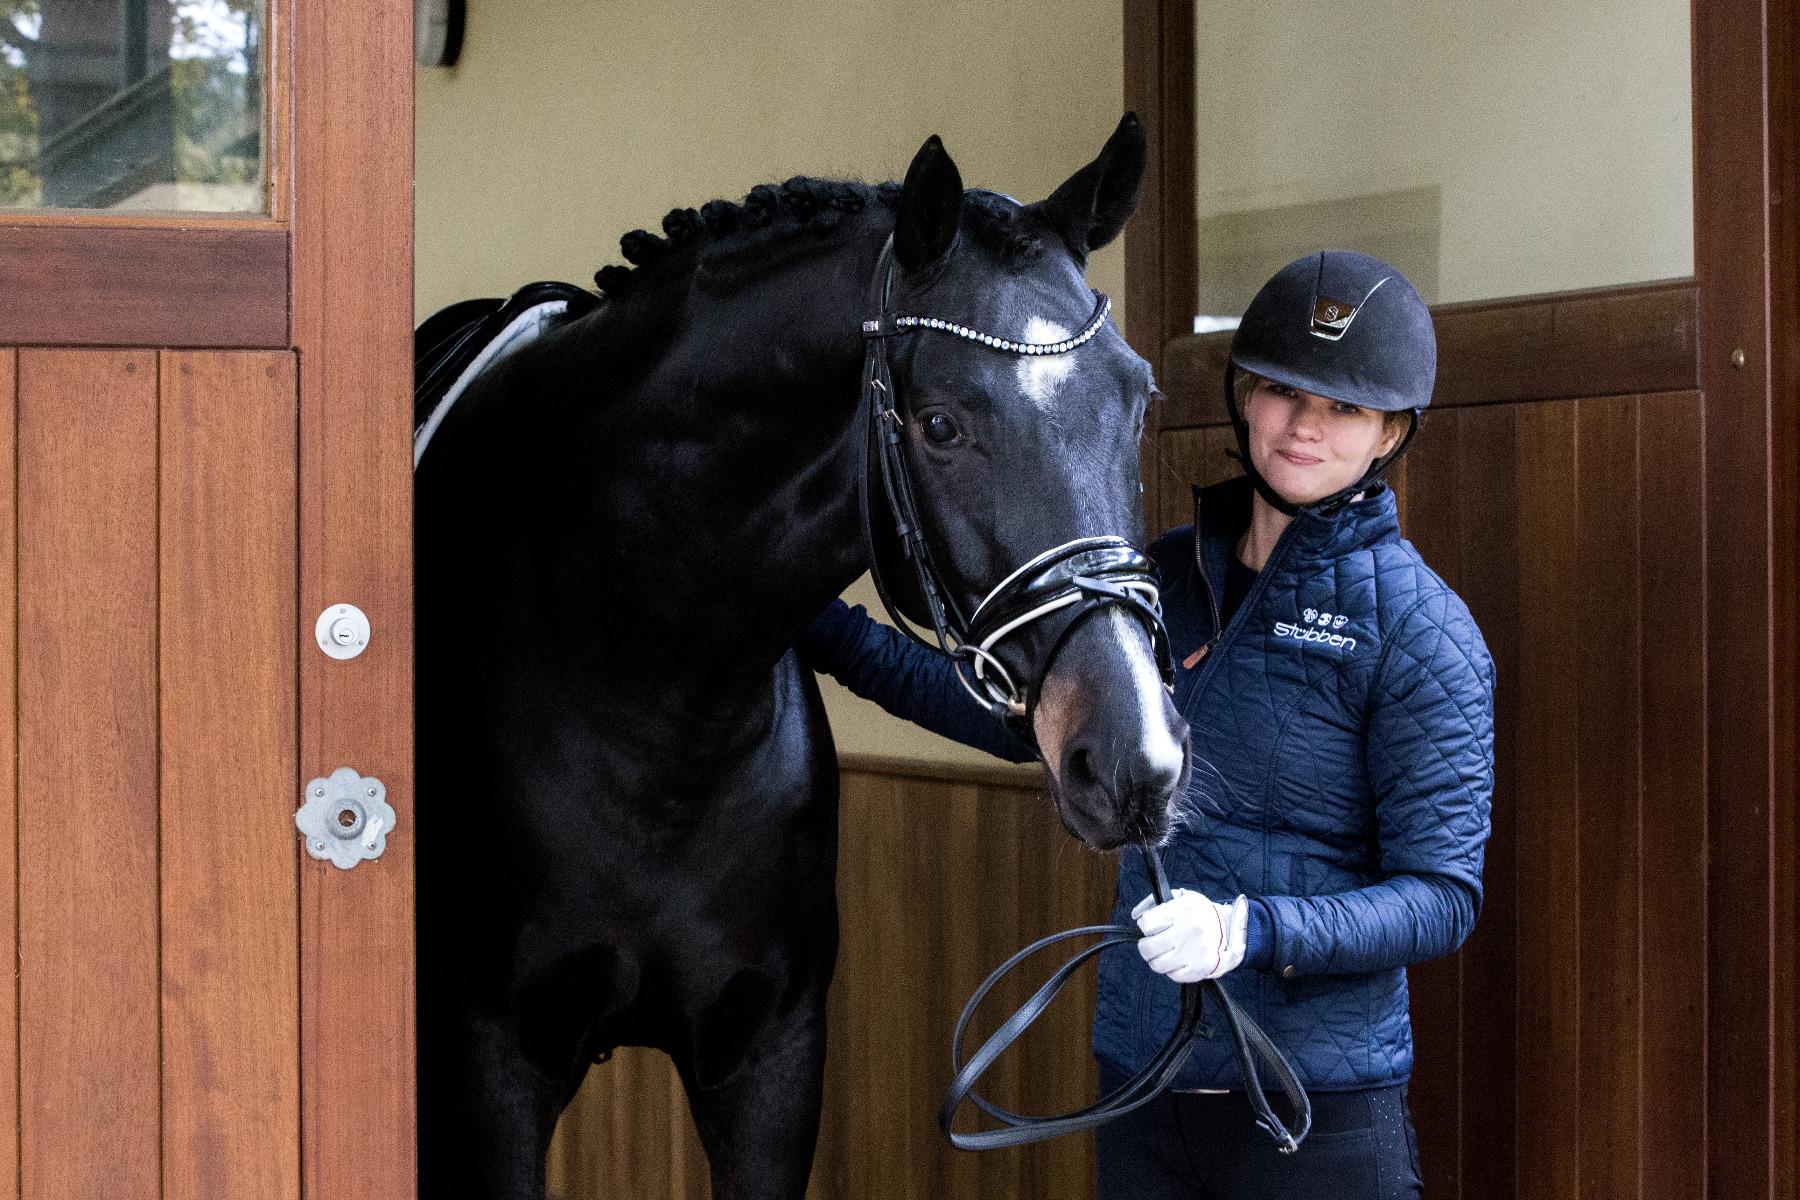 Stübben, Stuebben, Saddle, Gläserne Manufaktur, Emily Harris, Saddle fitting, Tom Sexton